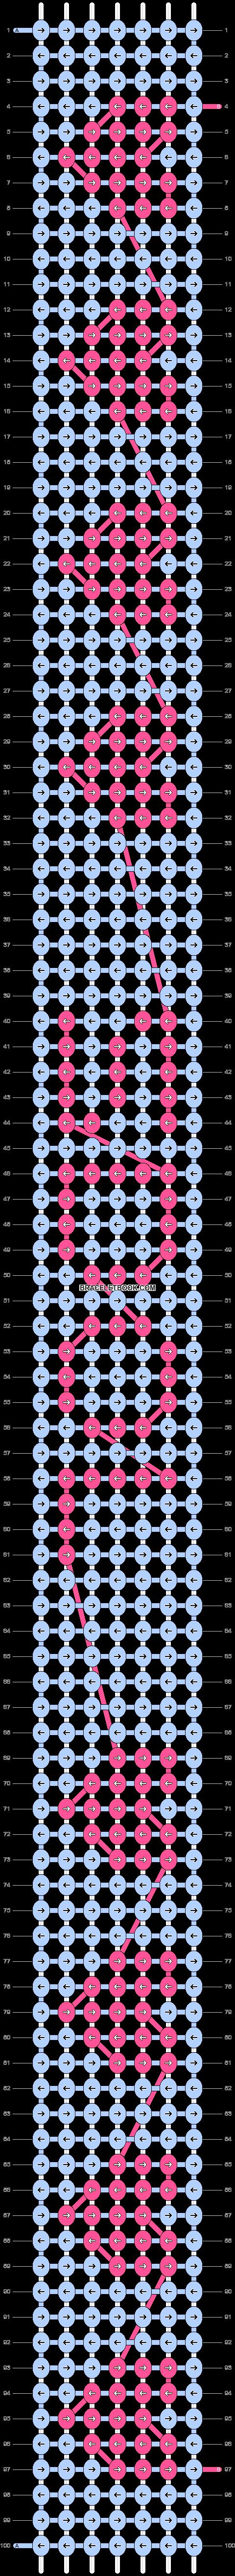 Alpha pattern #4464 pattern